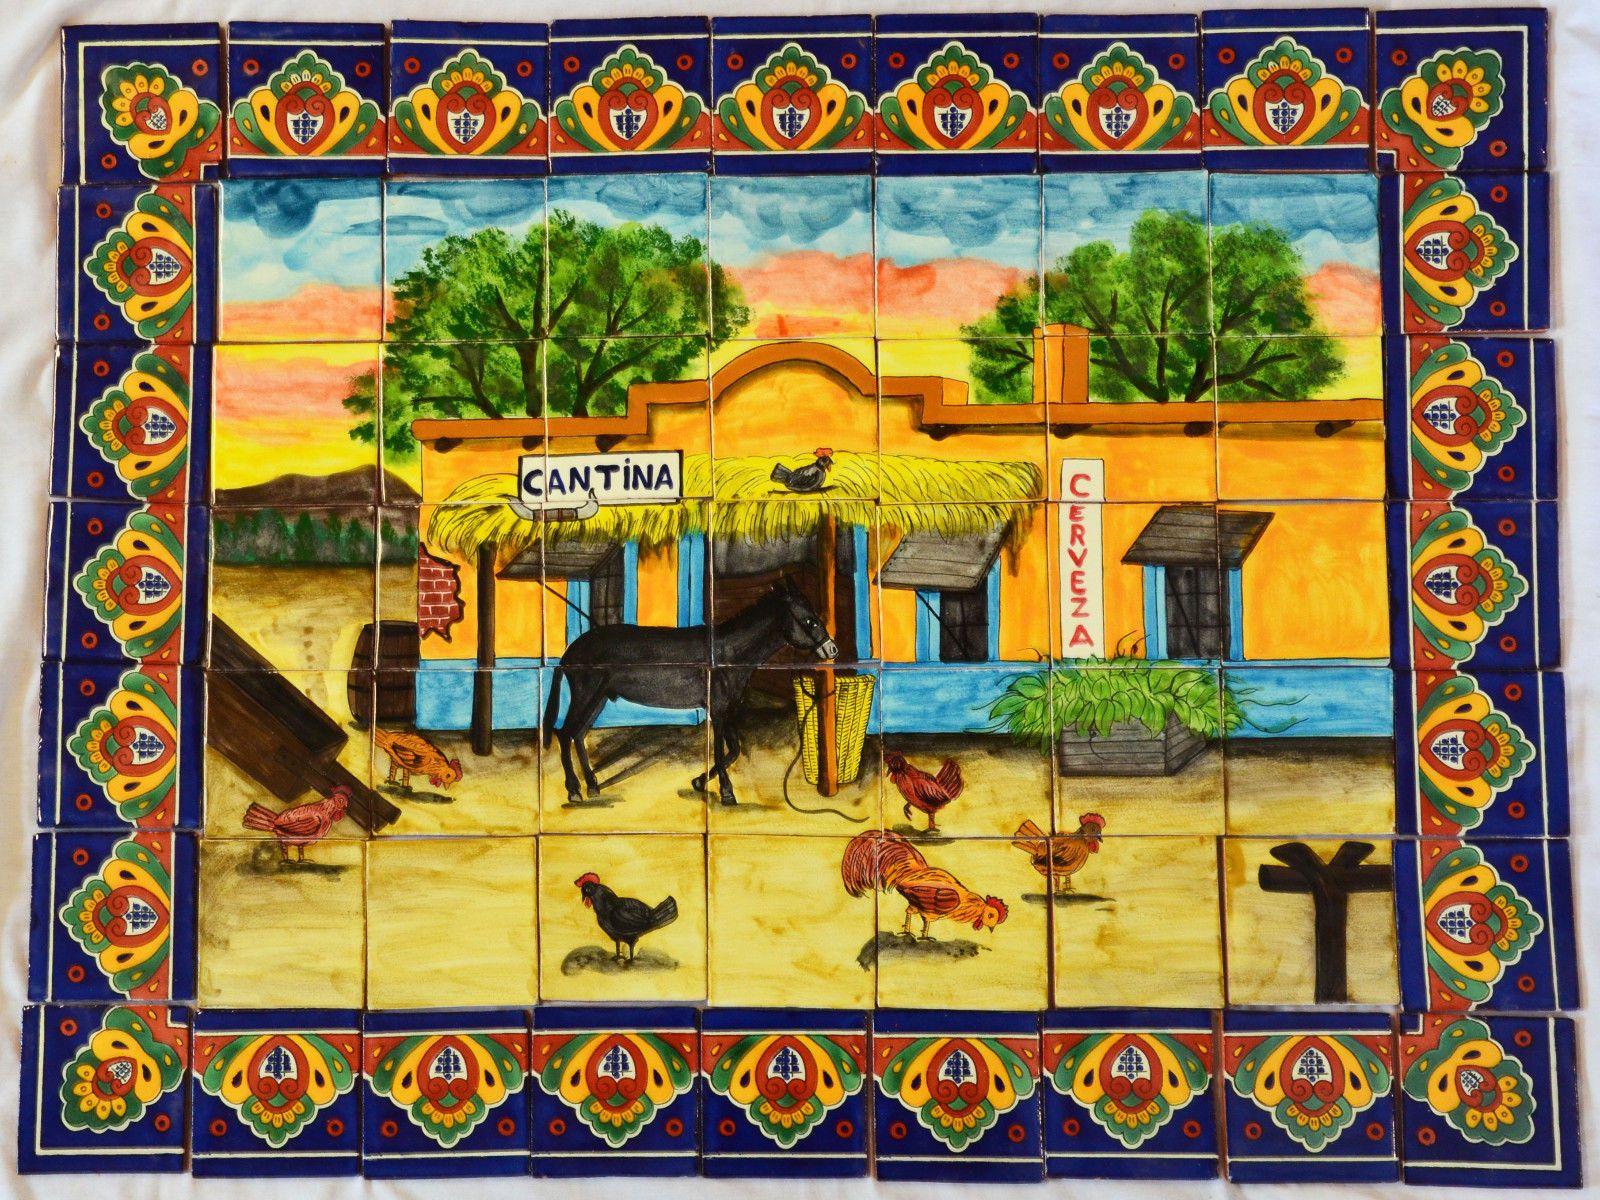 04 mexican talavera mosaic mural tile handmade folk art cantina 04 mexican talavera mosaic mural tile handmade folk art cantina bar backsplash amipublicfo Choice Image